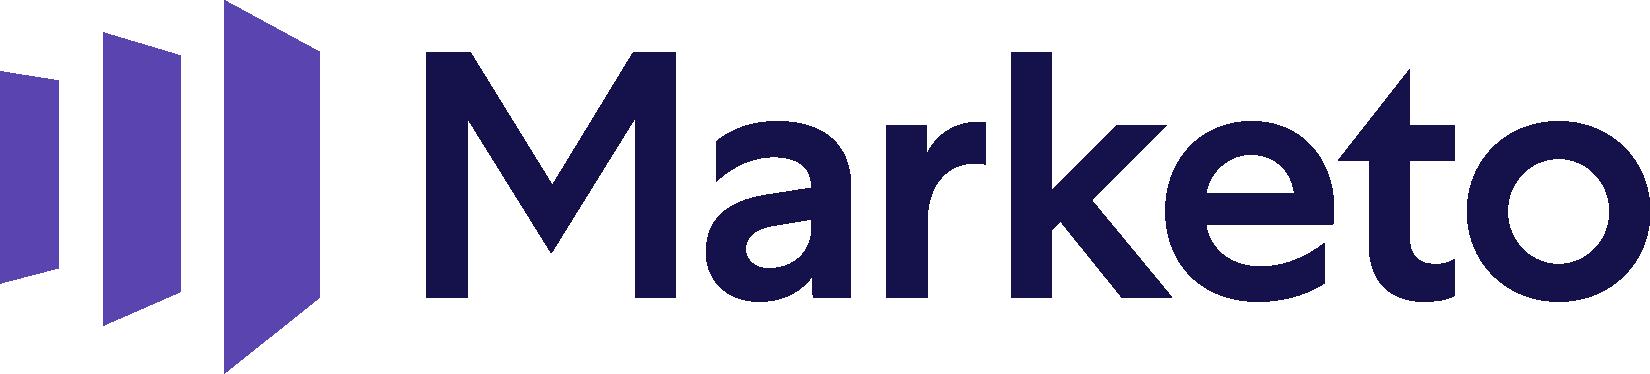 Marketo Careers Careers